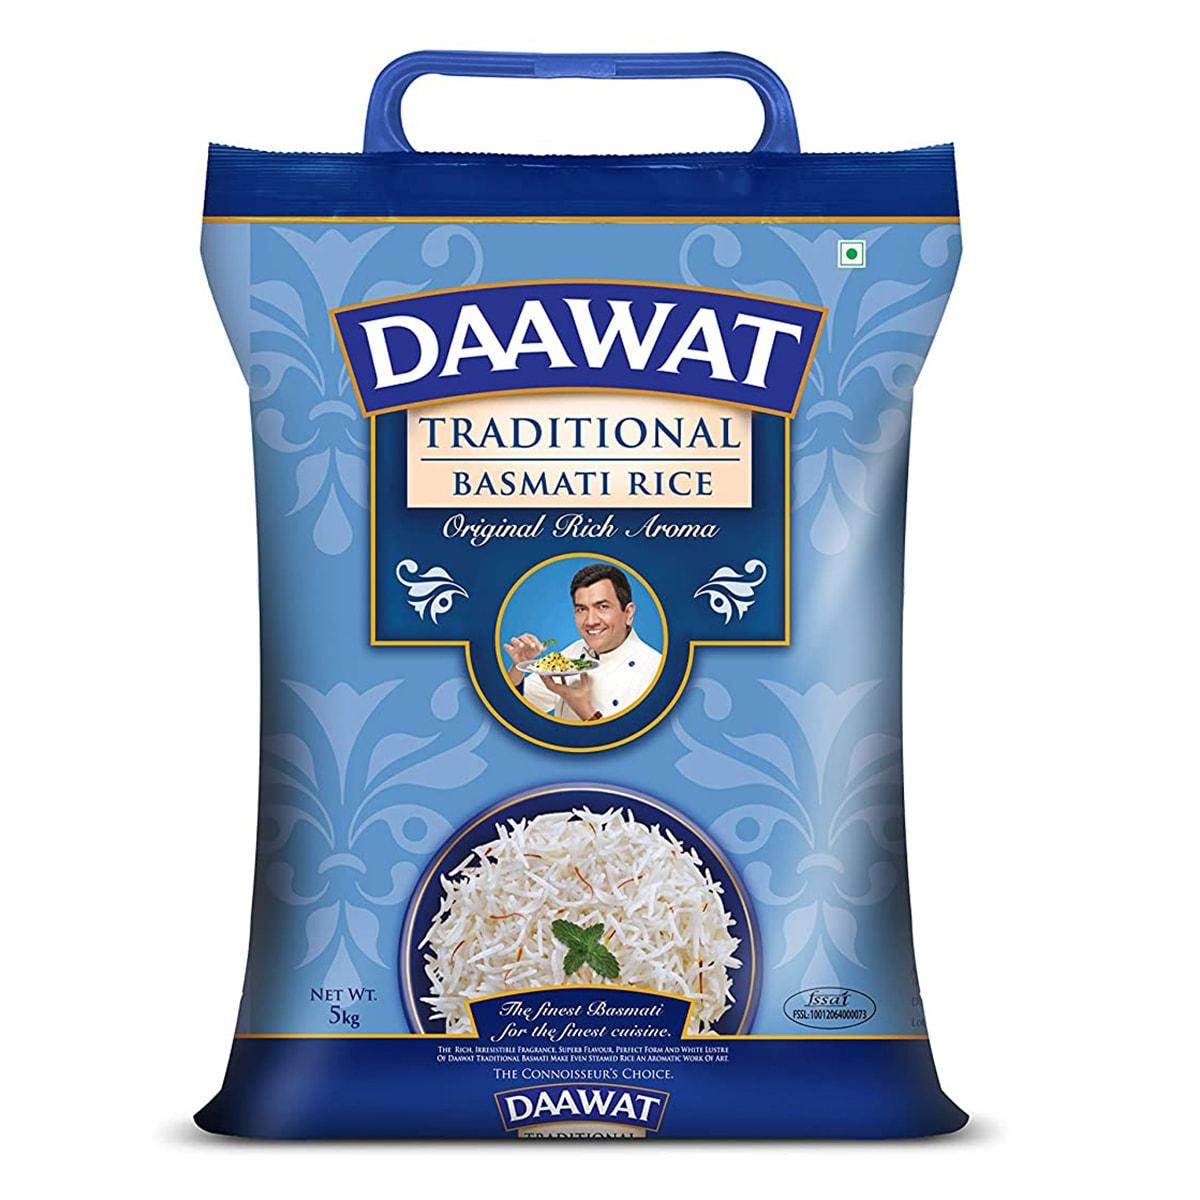 Buy Daawat Traditional Basmati Rice - 5 kg